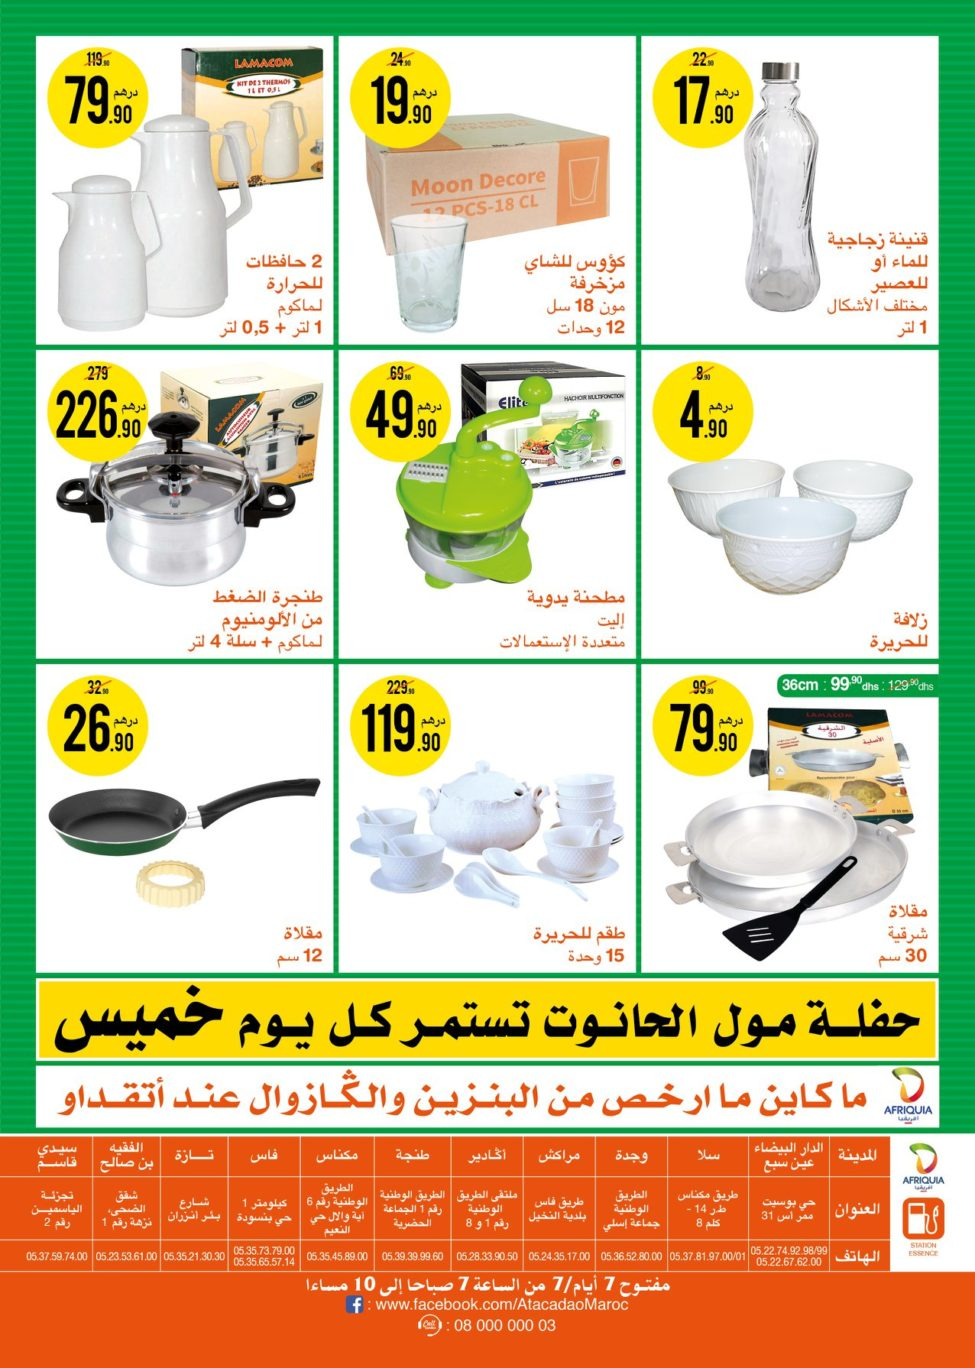 Catalogue Atacadao Maroc عواشر مبروكة du 11 Avril au 1 Mai 2019